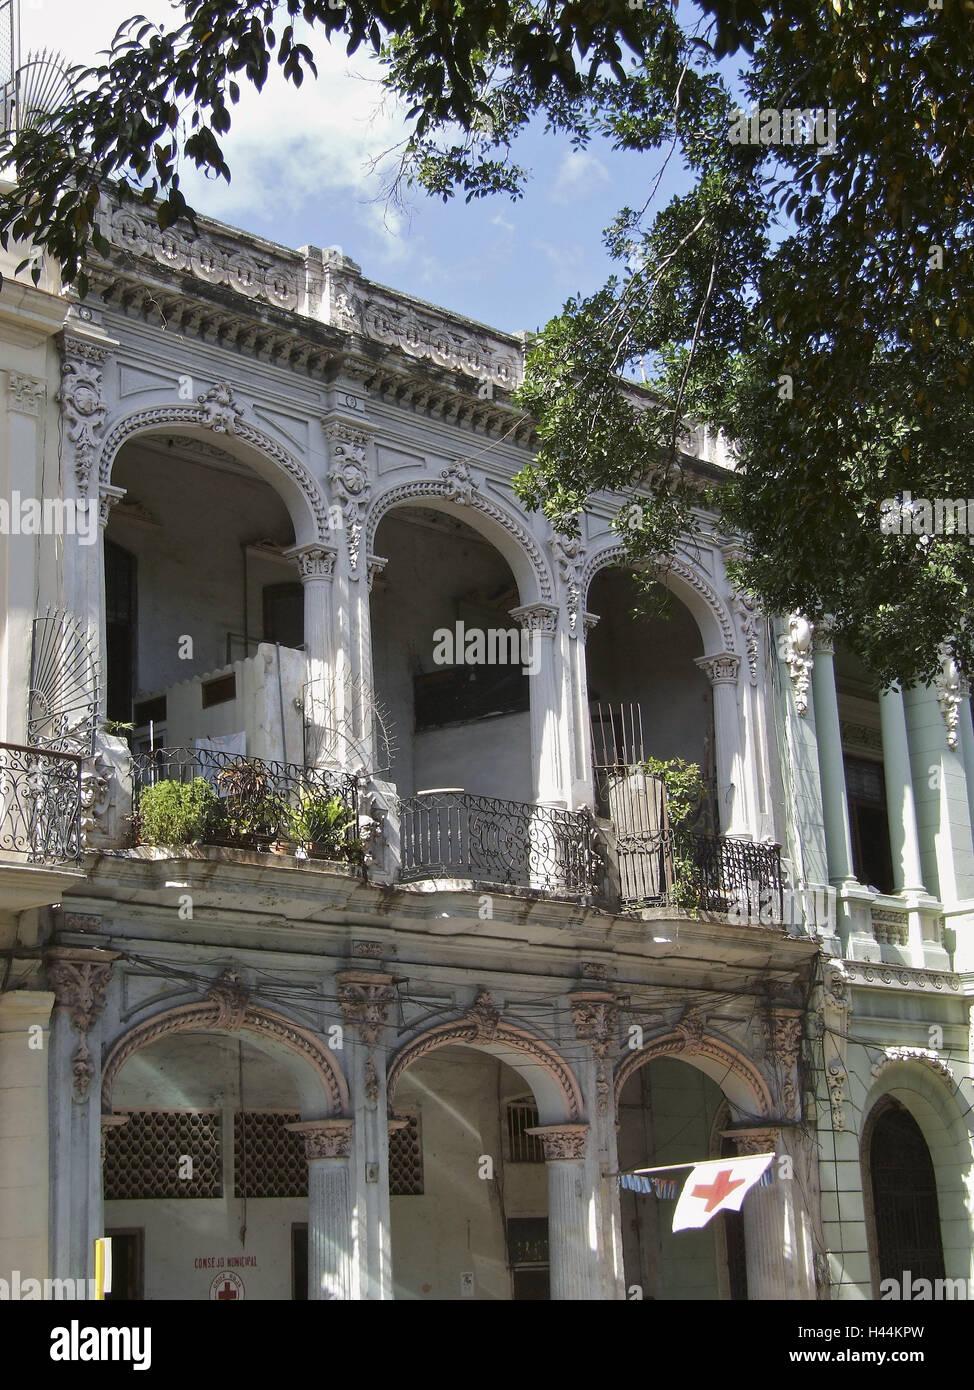 Cuba Havana City Centre Houses Colonial Style Holiday Destination